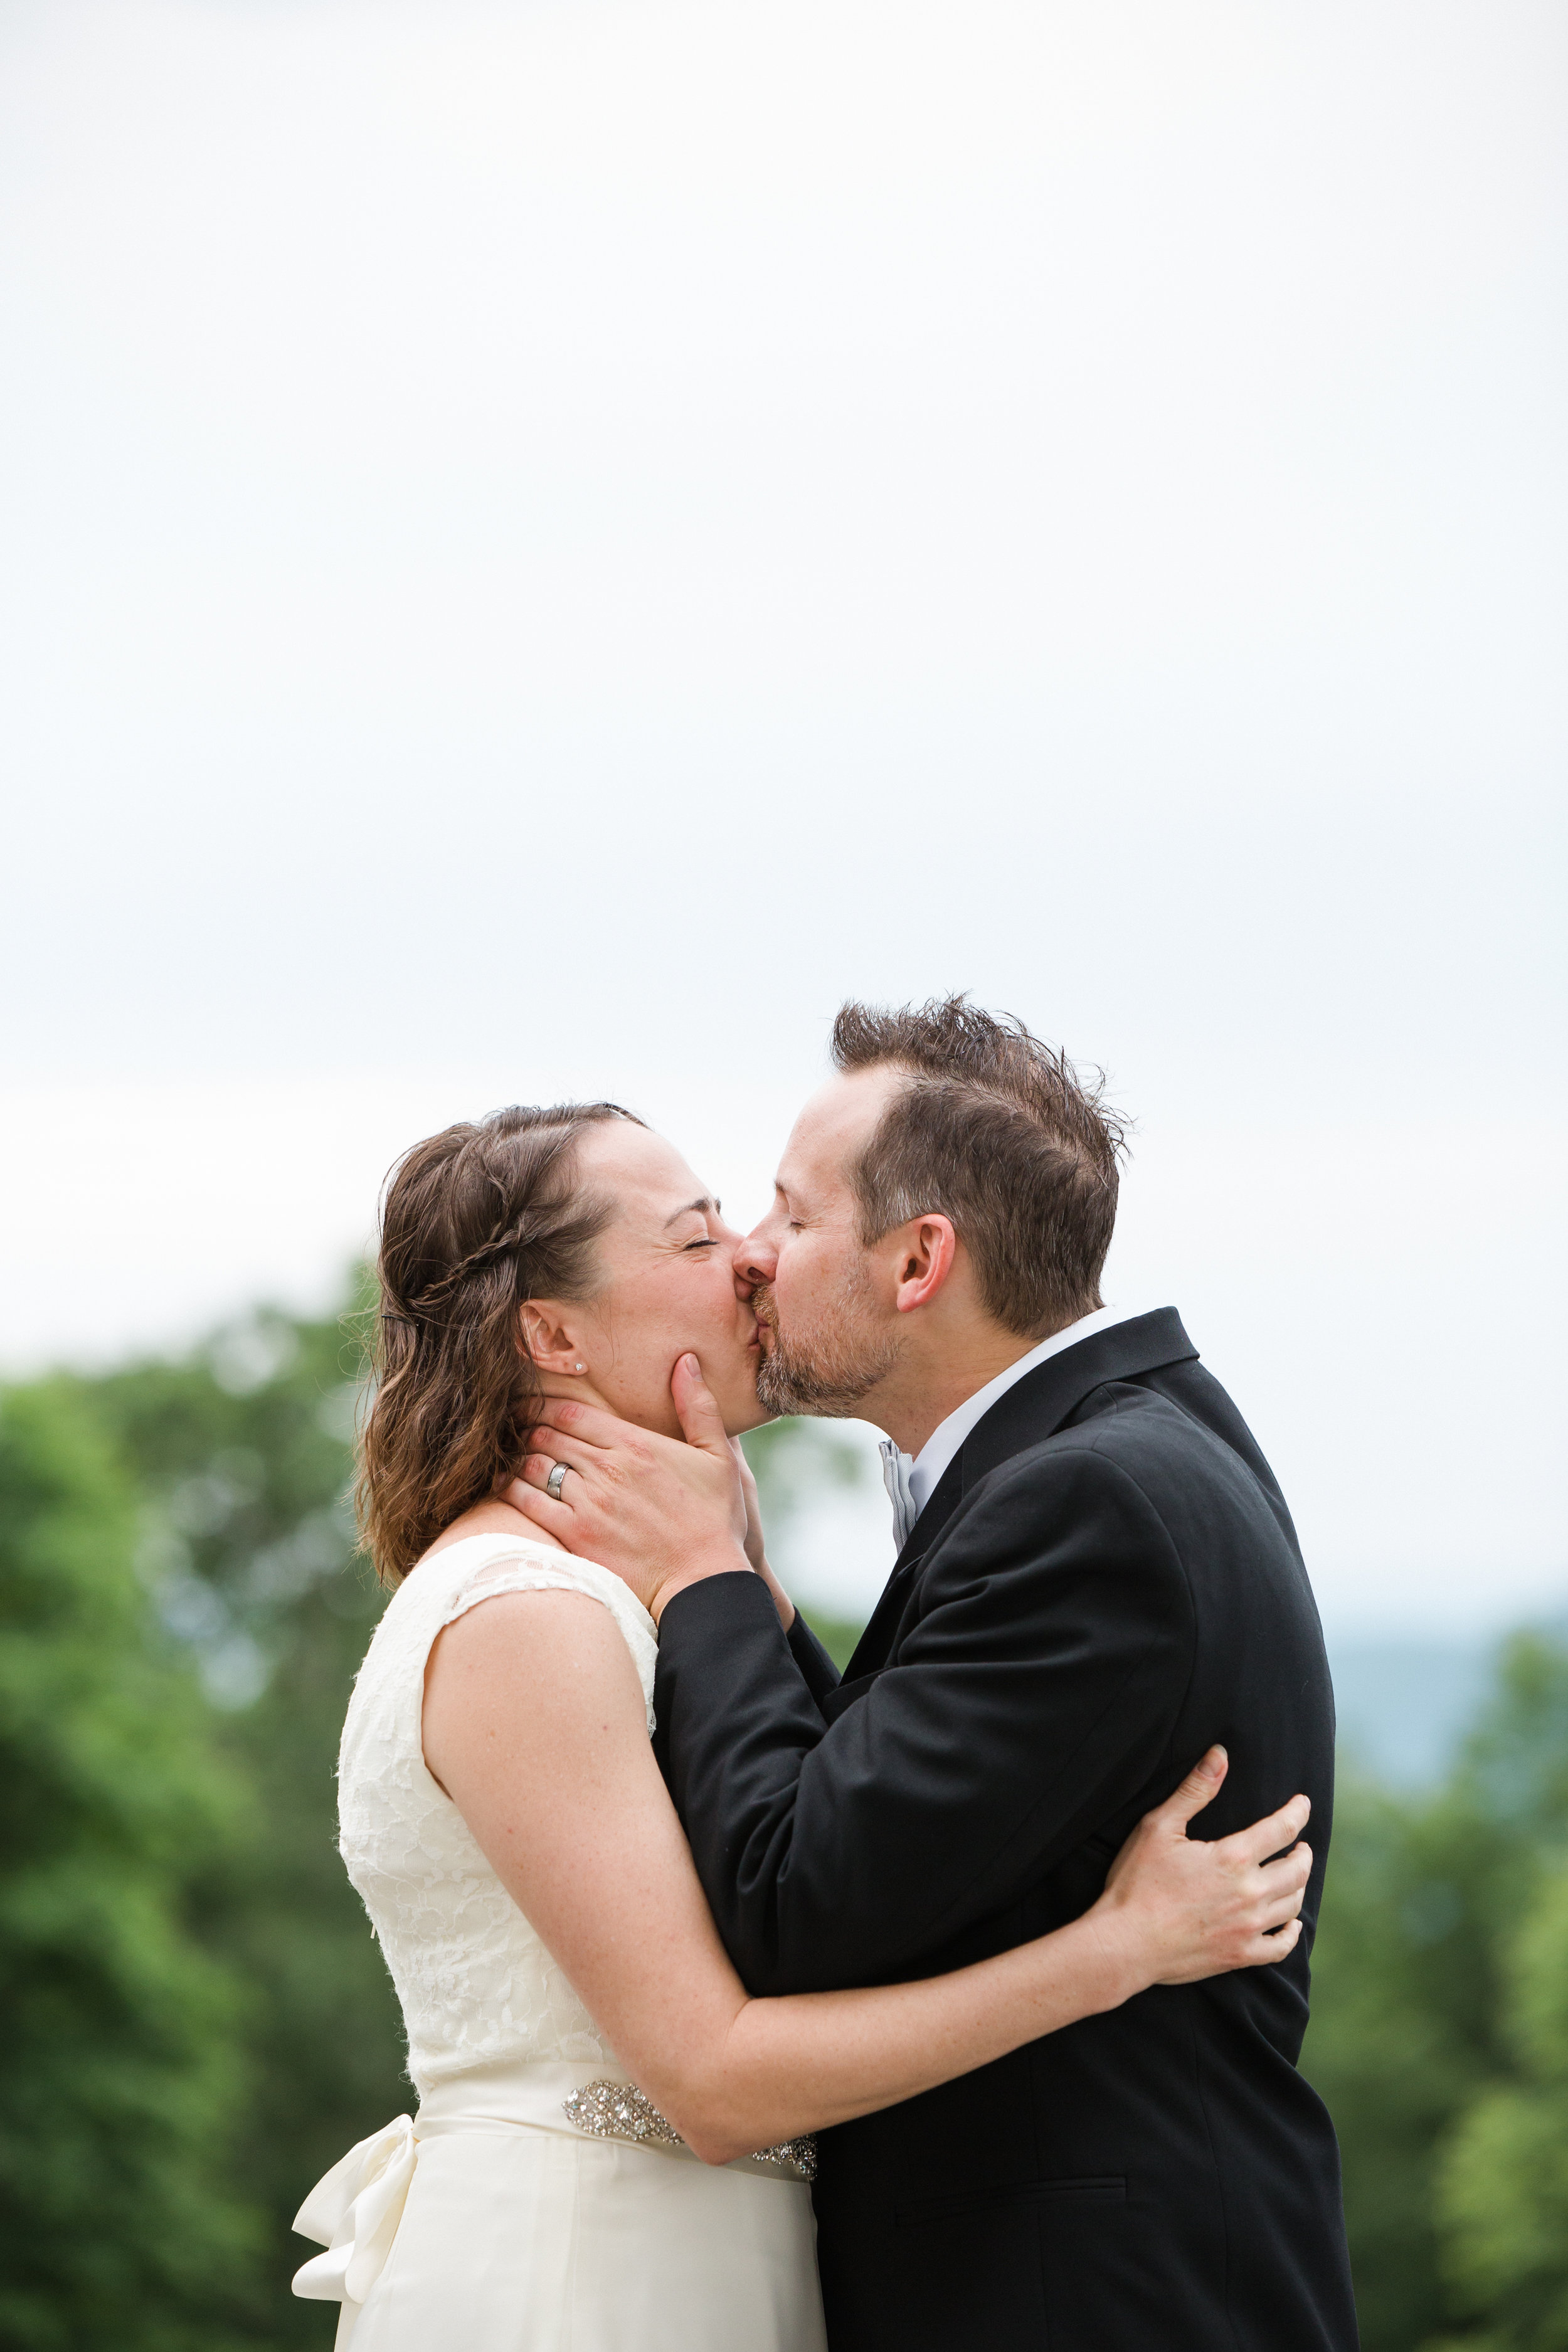 aubrey-joshua-wedding-179.jpg